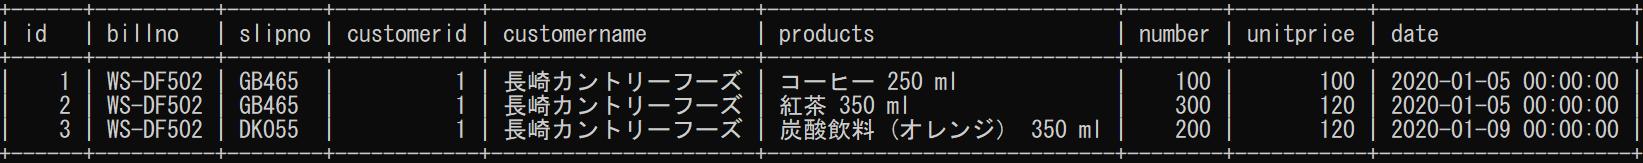 MySQLに登録したデータ